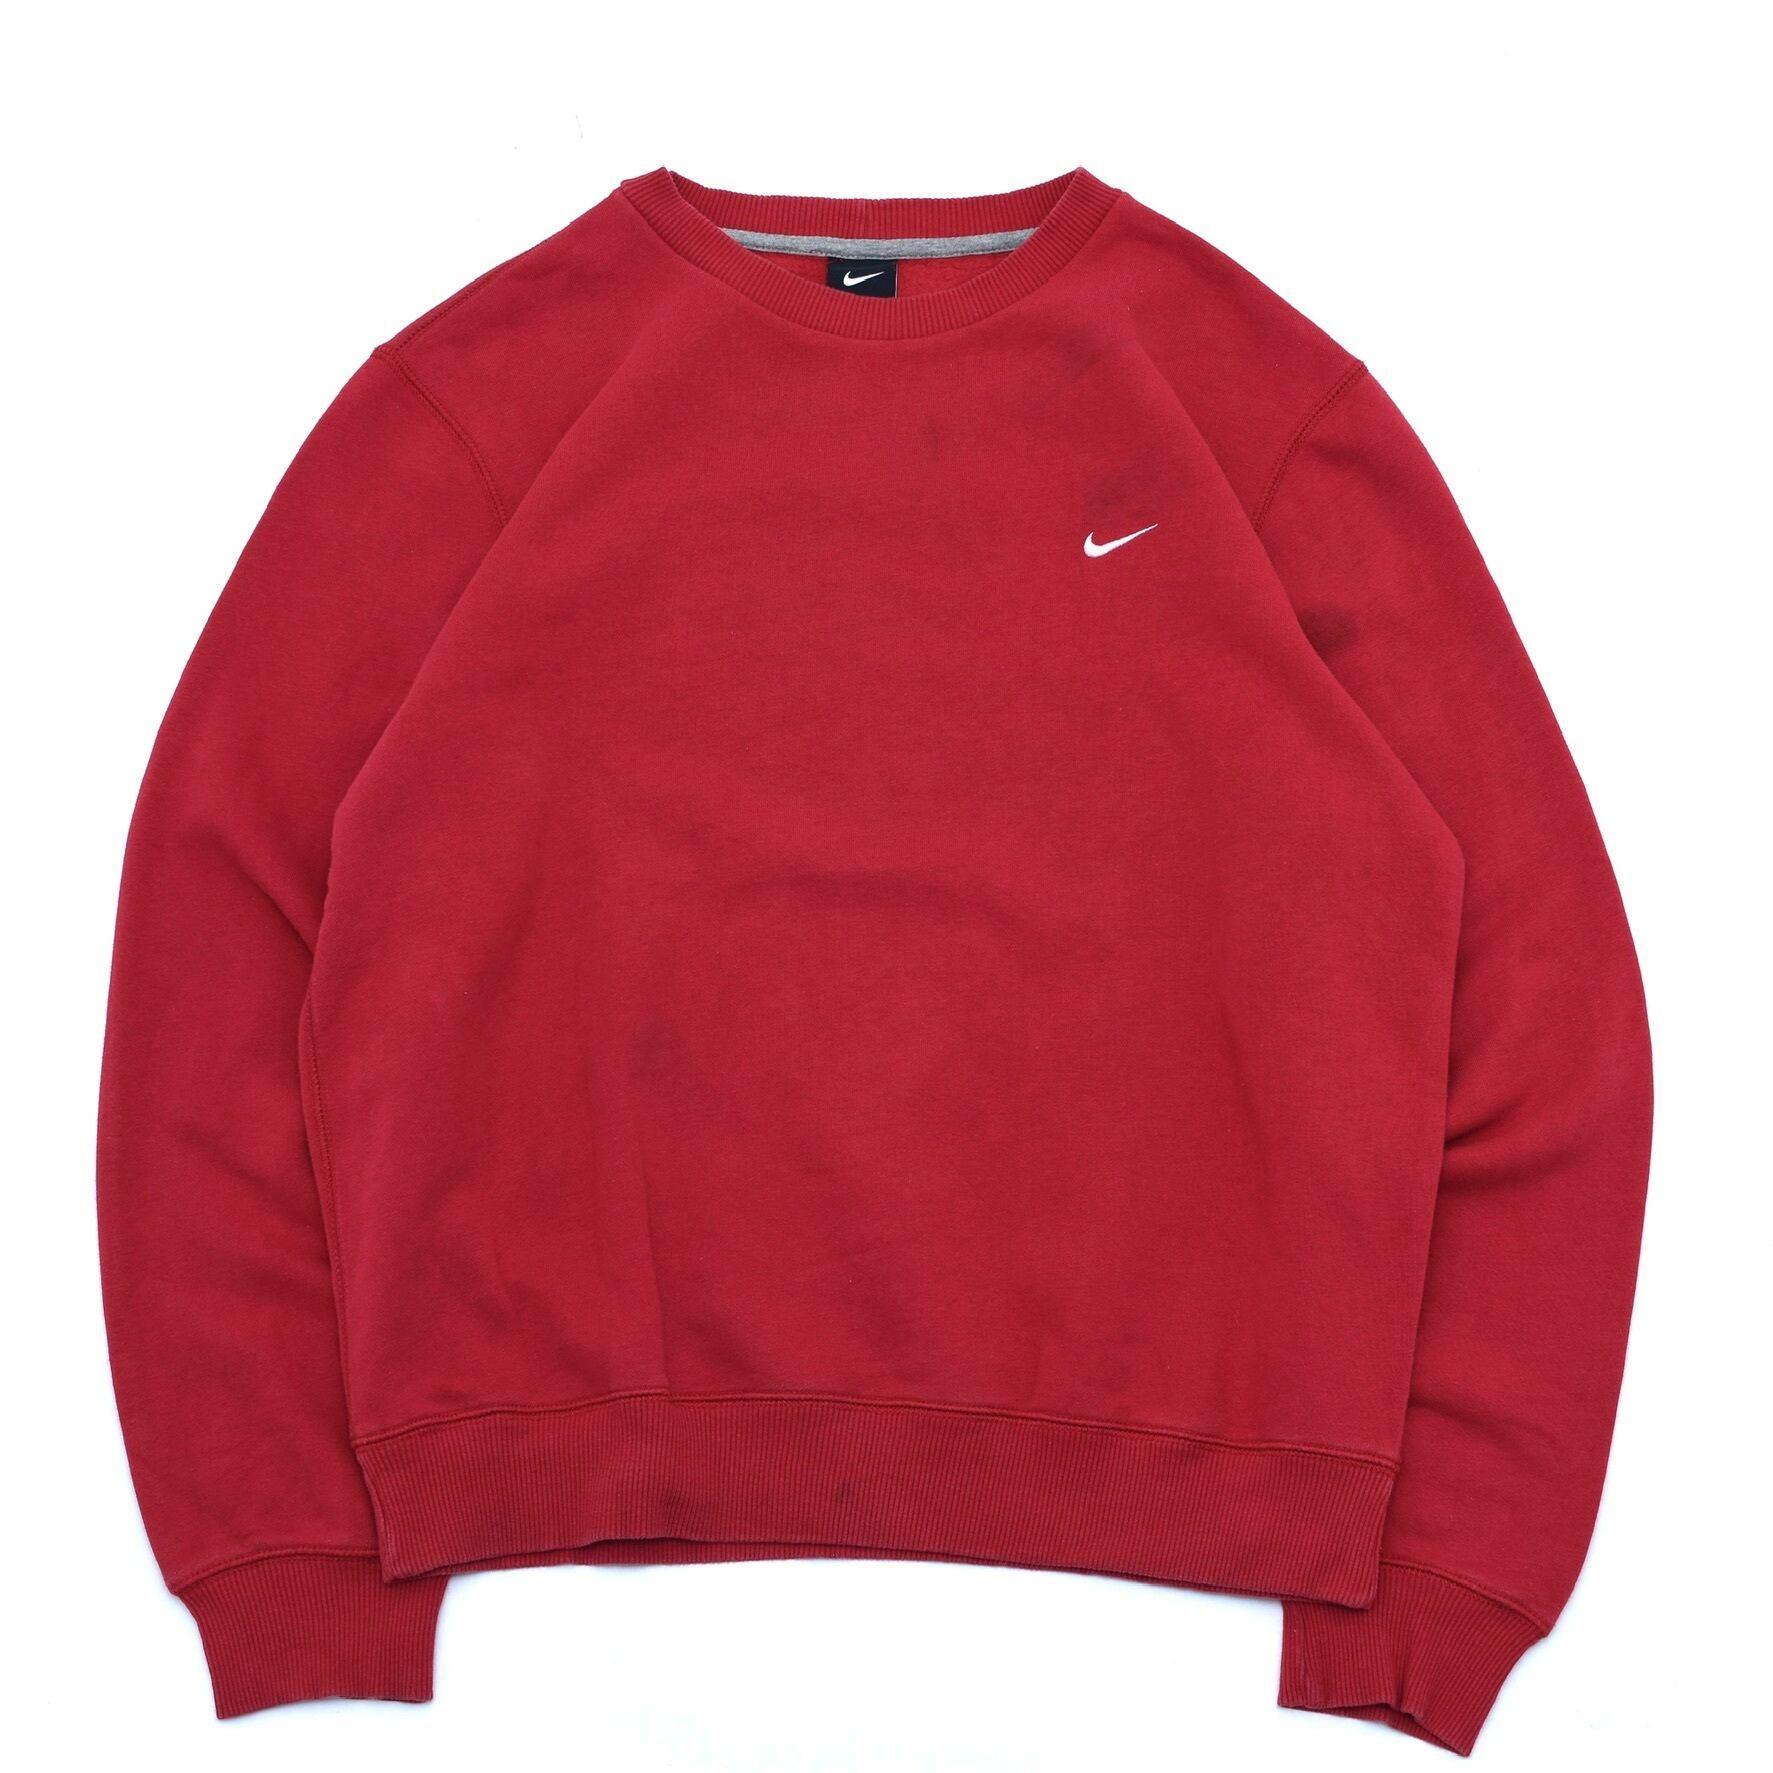 NIKE one point logo sweatshirt